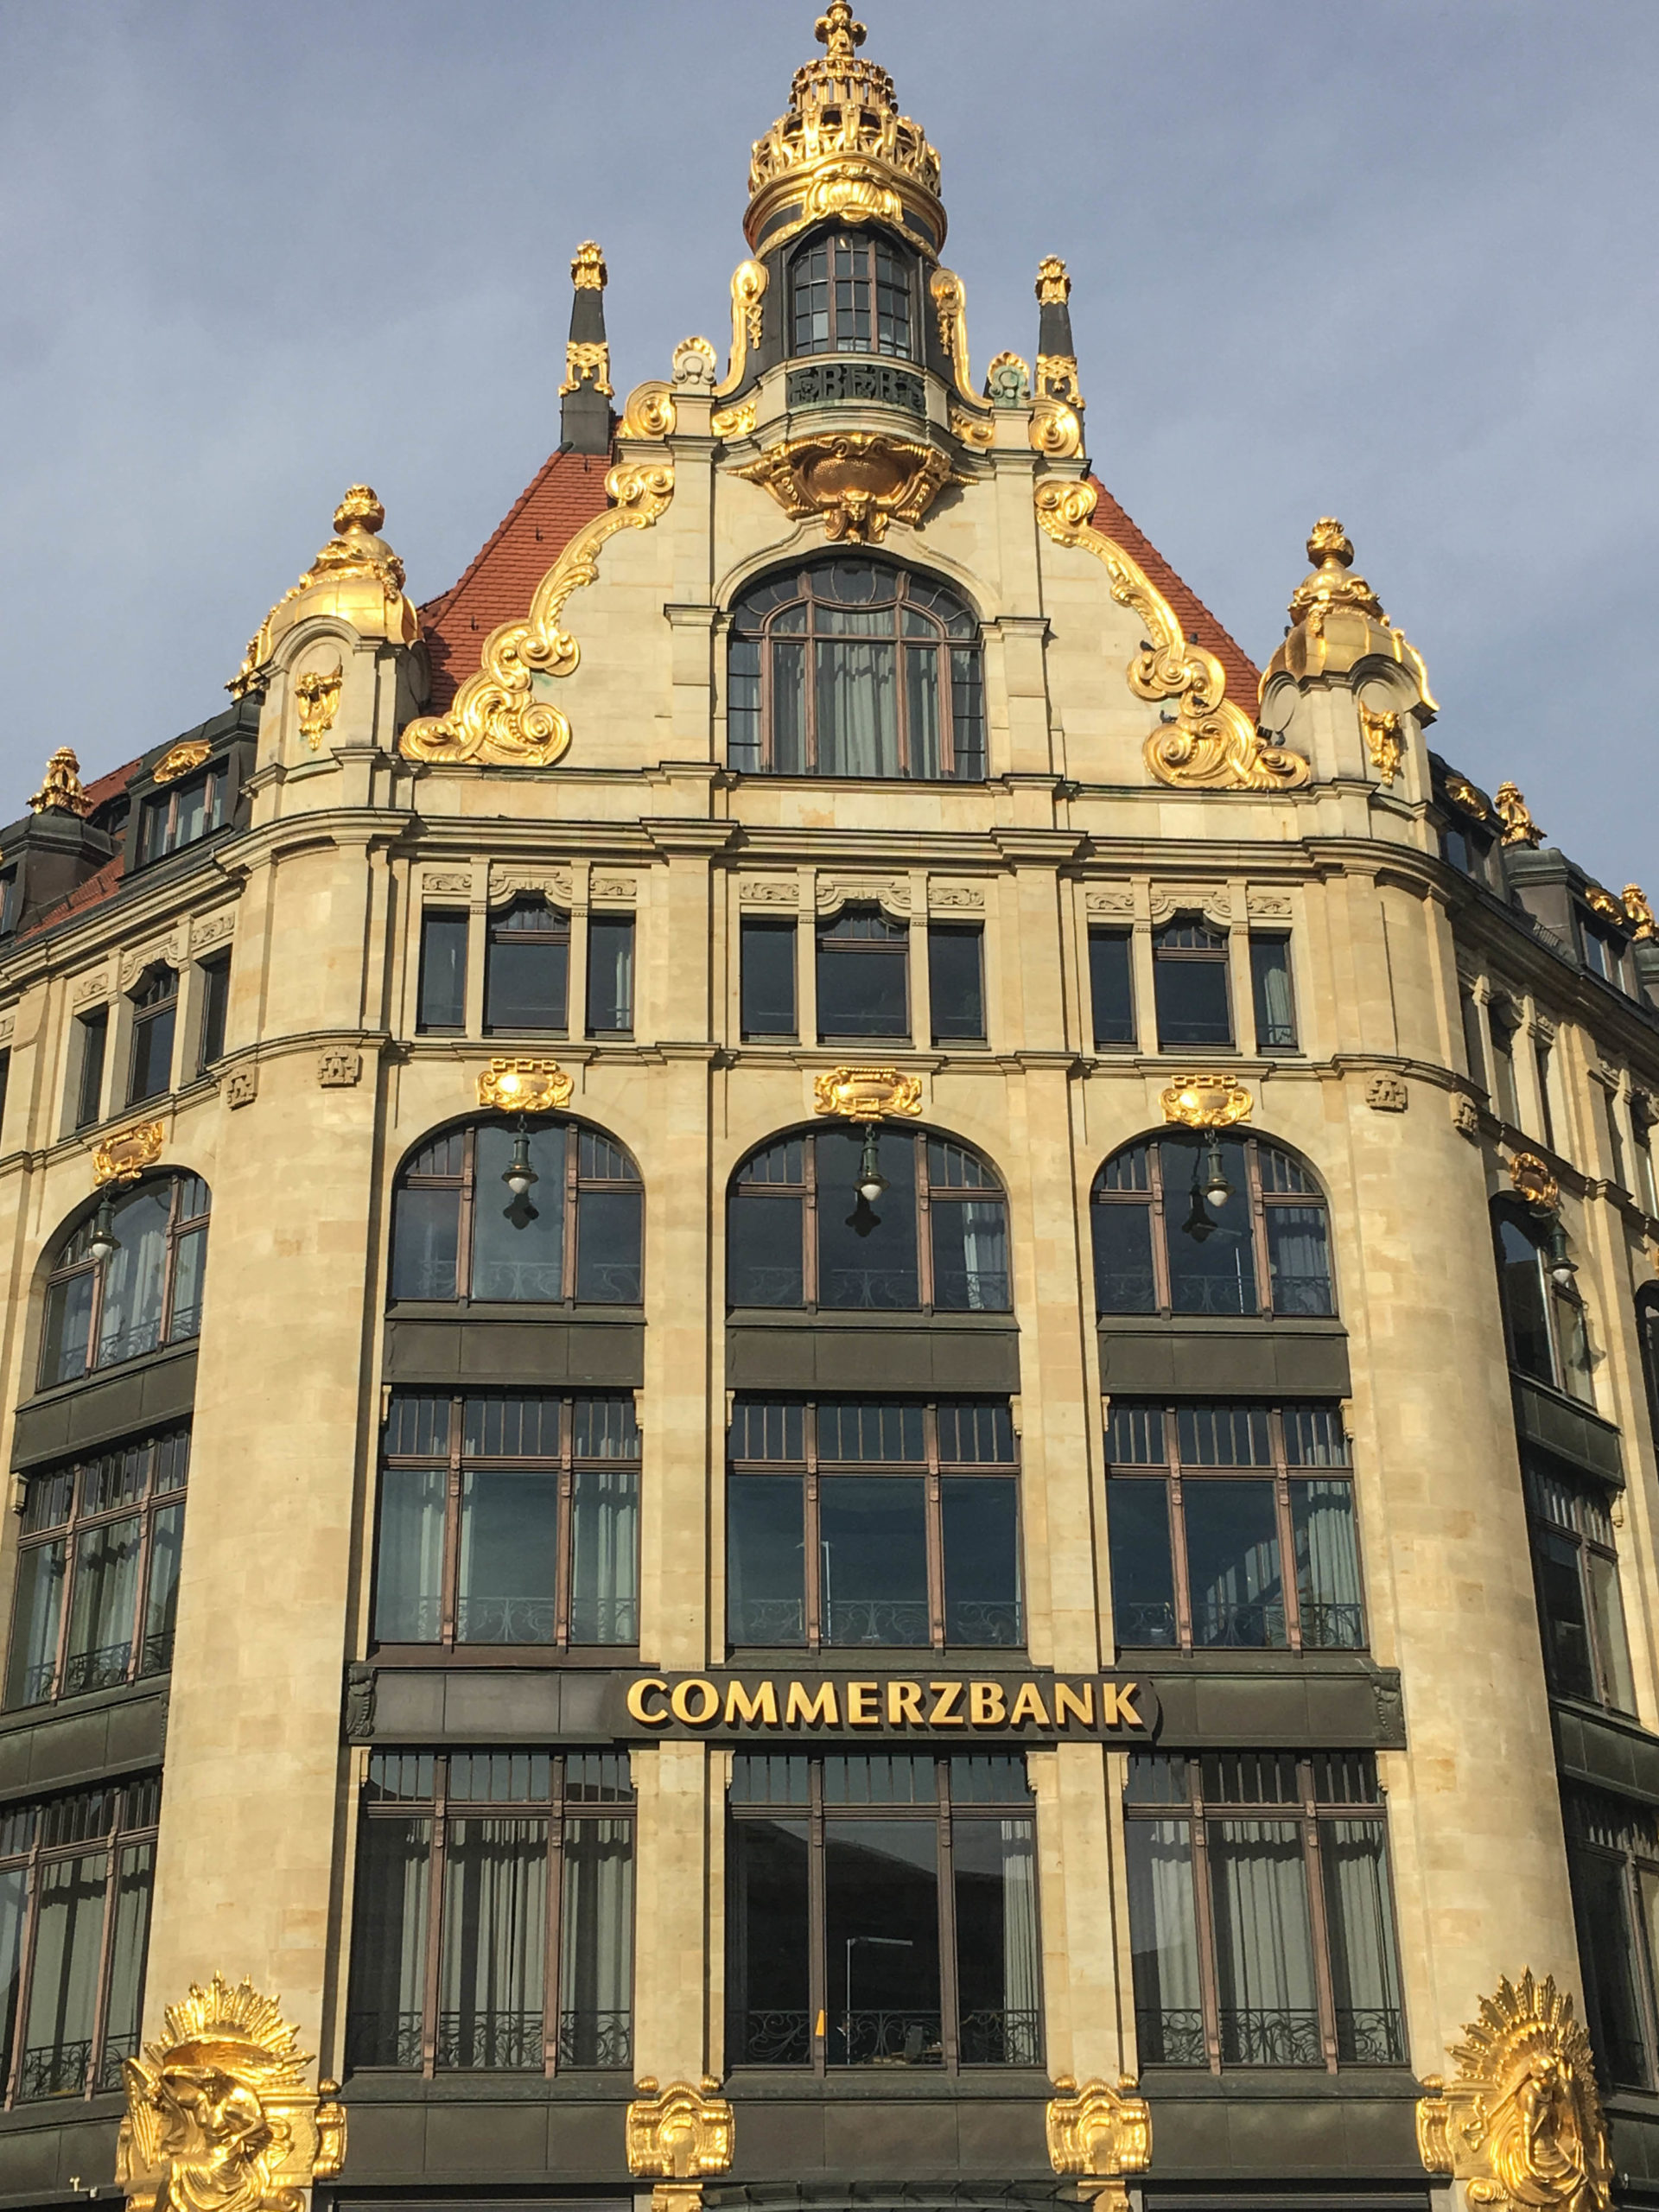 Kaufhaus Ebert, 1902-1904. Architekt: August Hermann Schmidt, Arthur Johlige